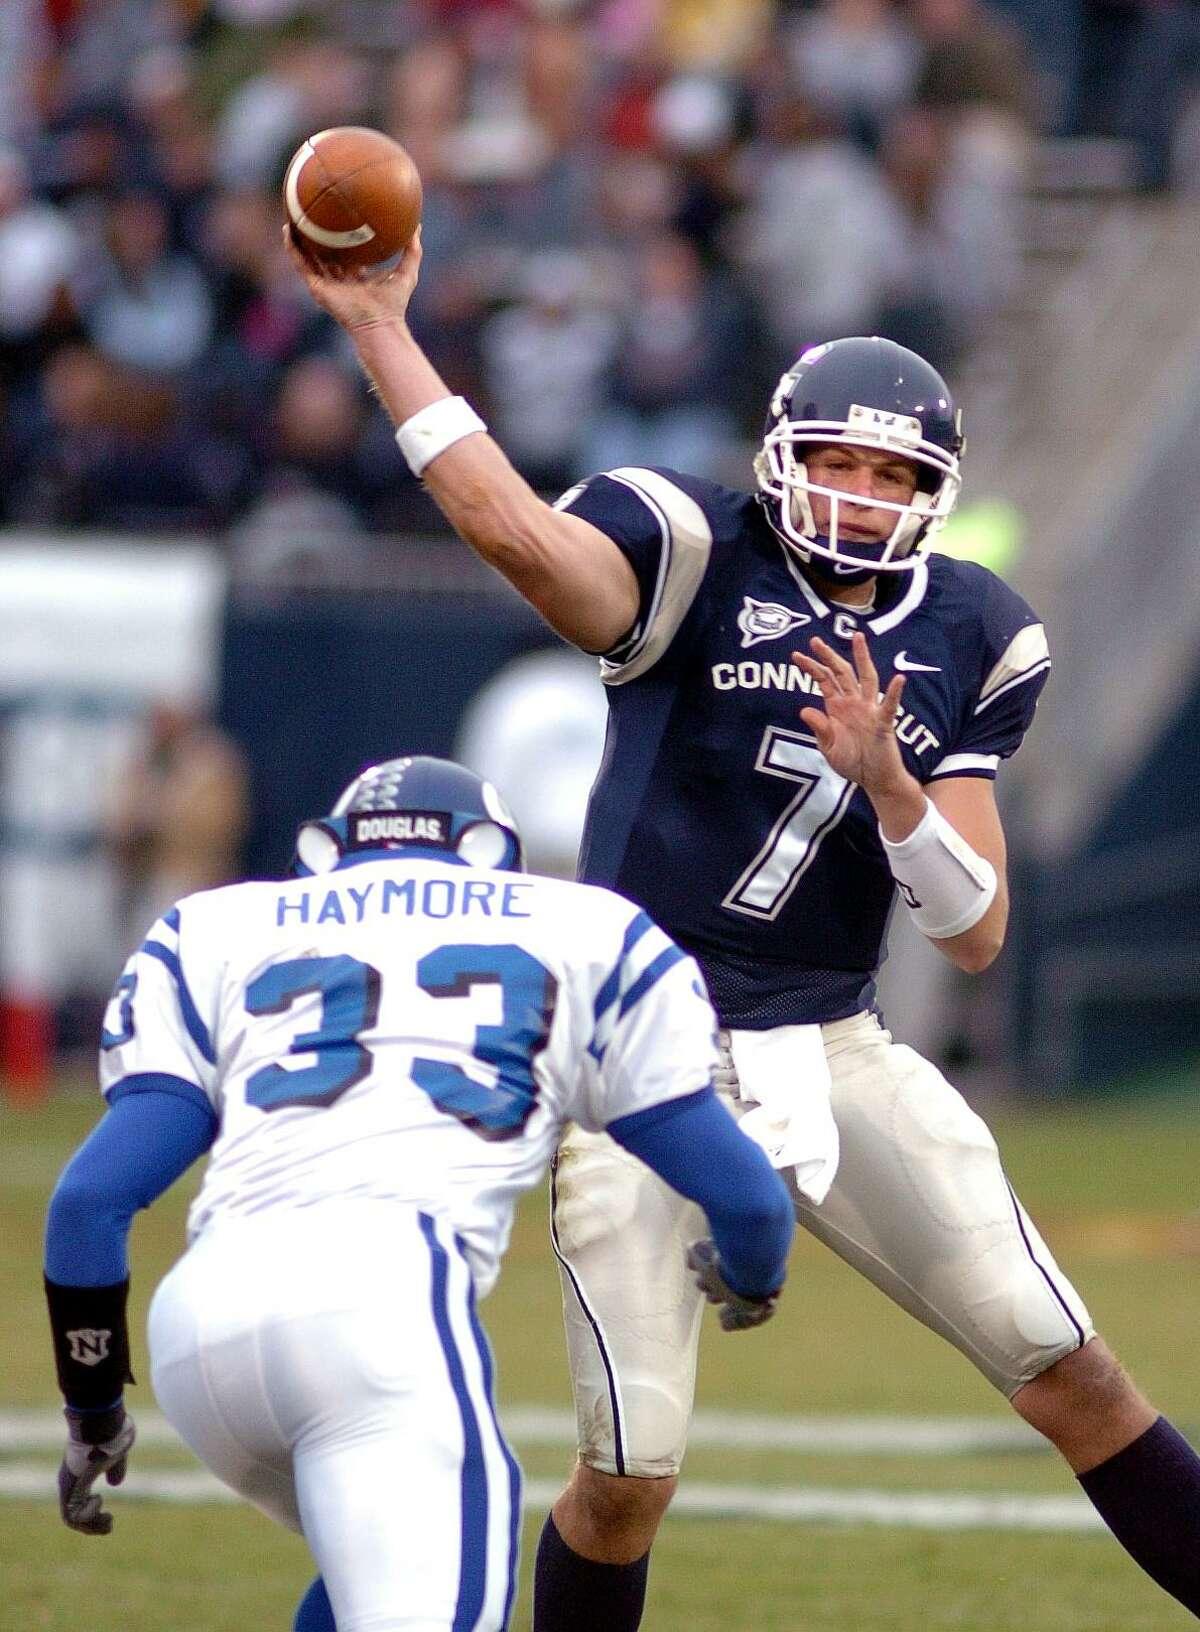 UConn quarterback Dan Orlovsky completes a pass as Buffalo's Laron Haymore defends in a November 2004 game.